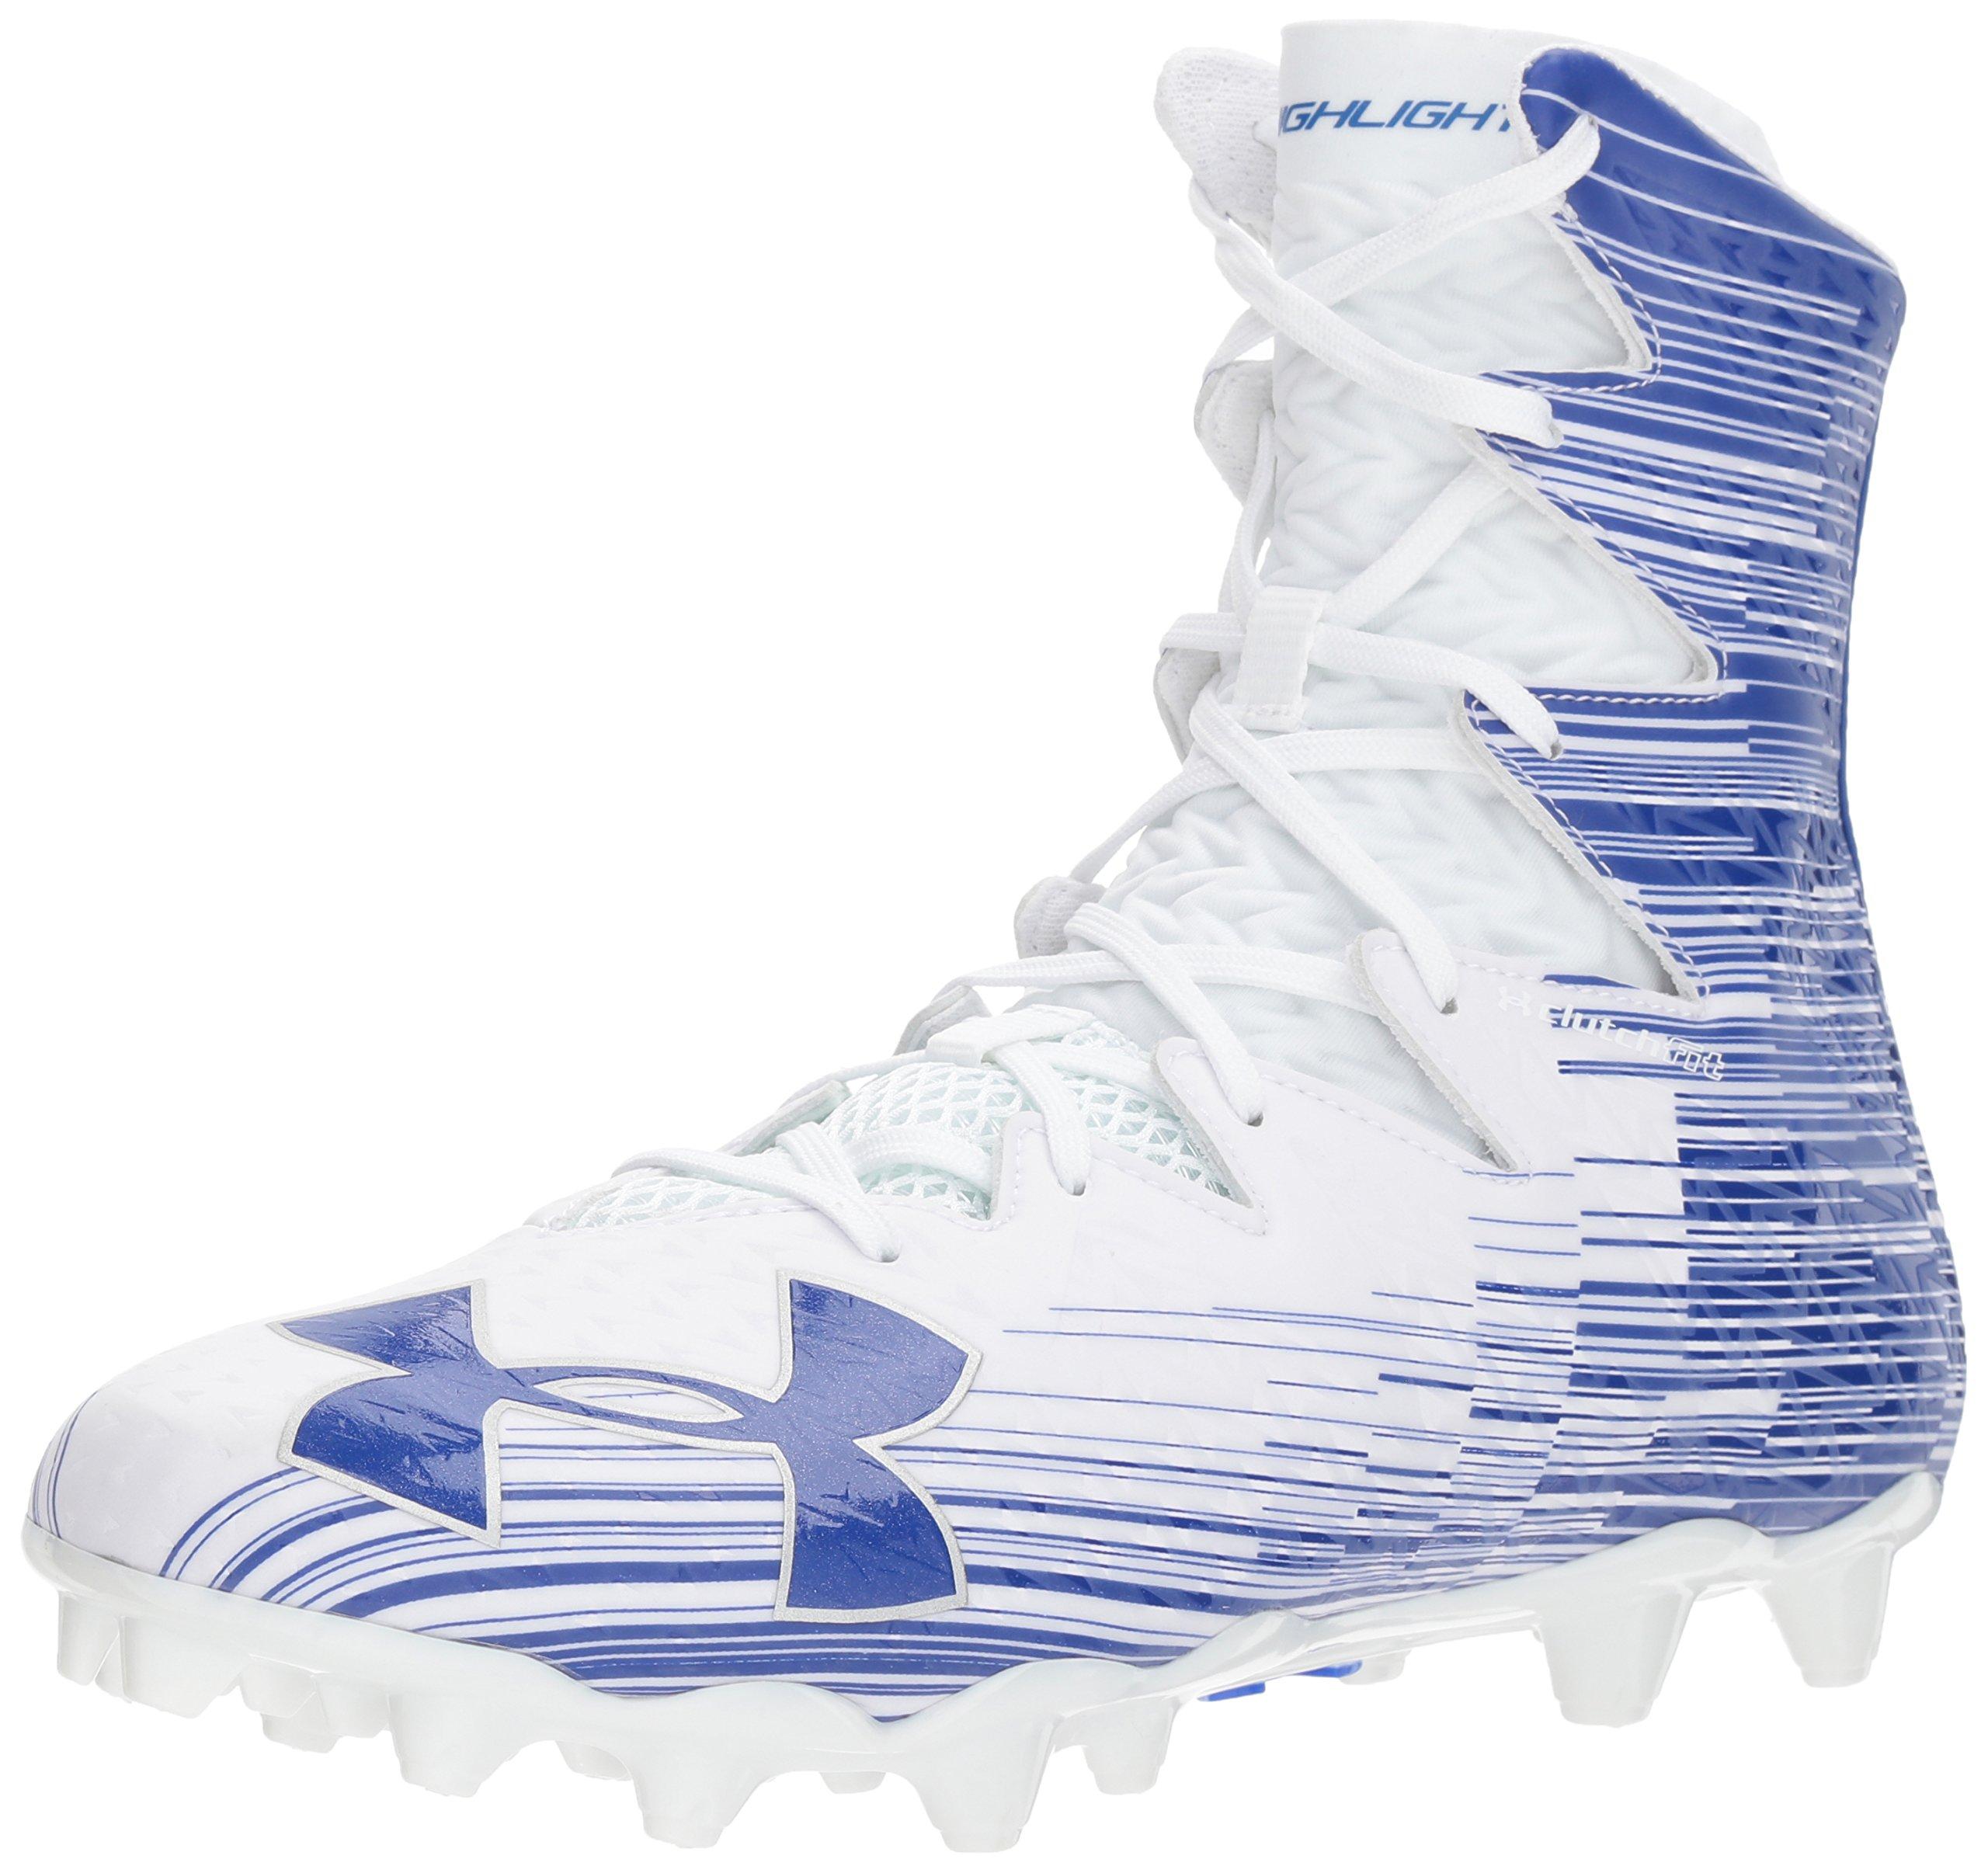 Under Armour Men's Highlight M.C. Lacrosse Shoe White (141)/Team Royal 8.5